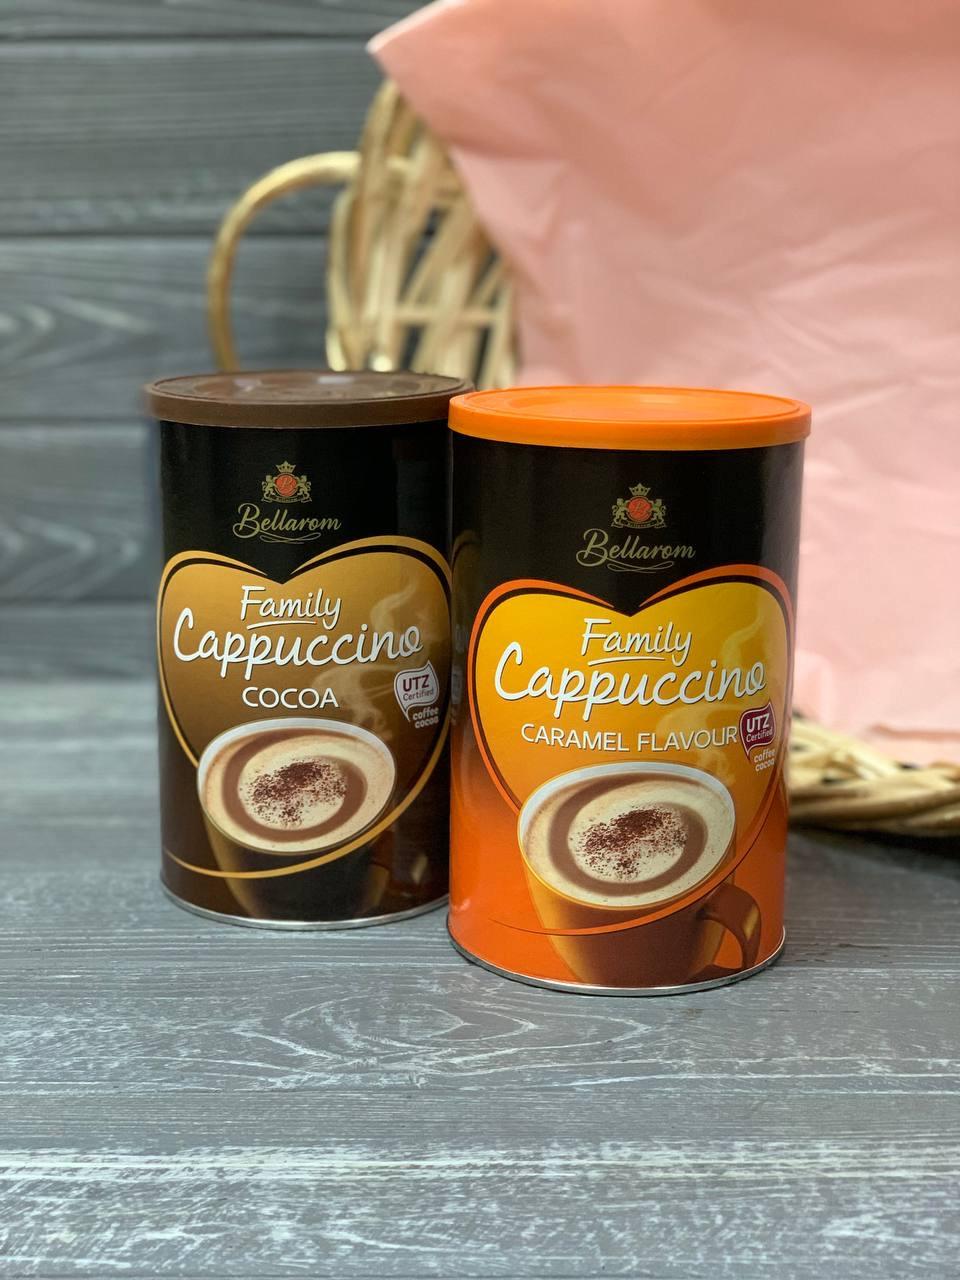 Капучино Bellarom Cappuccino Family Caramel / Cocoa